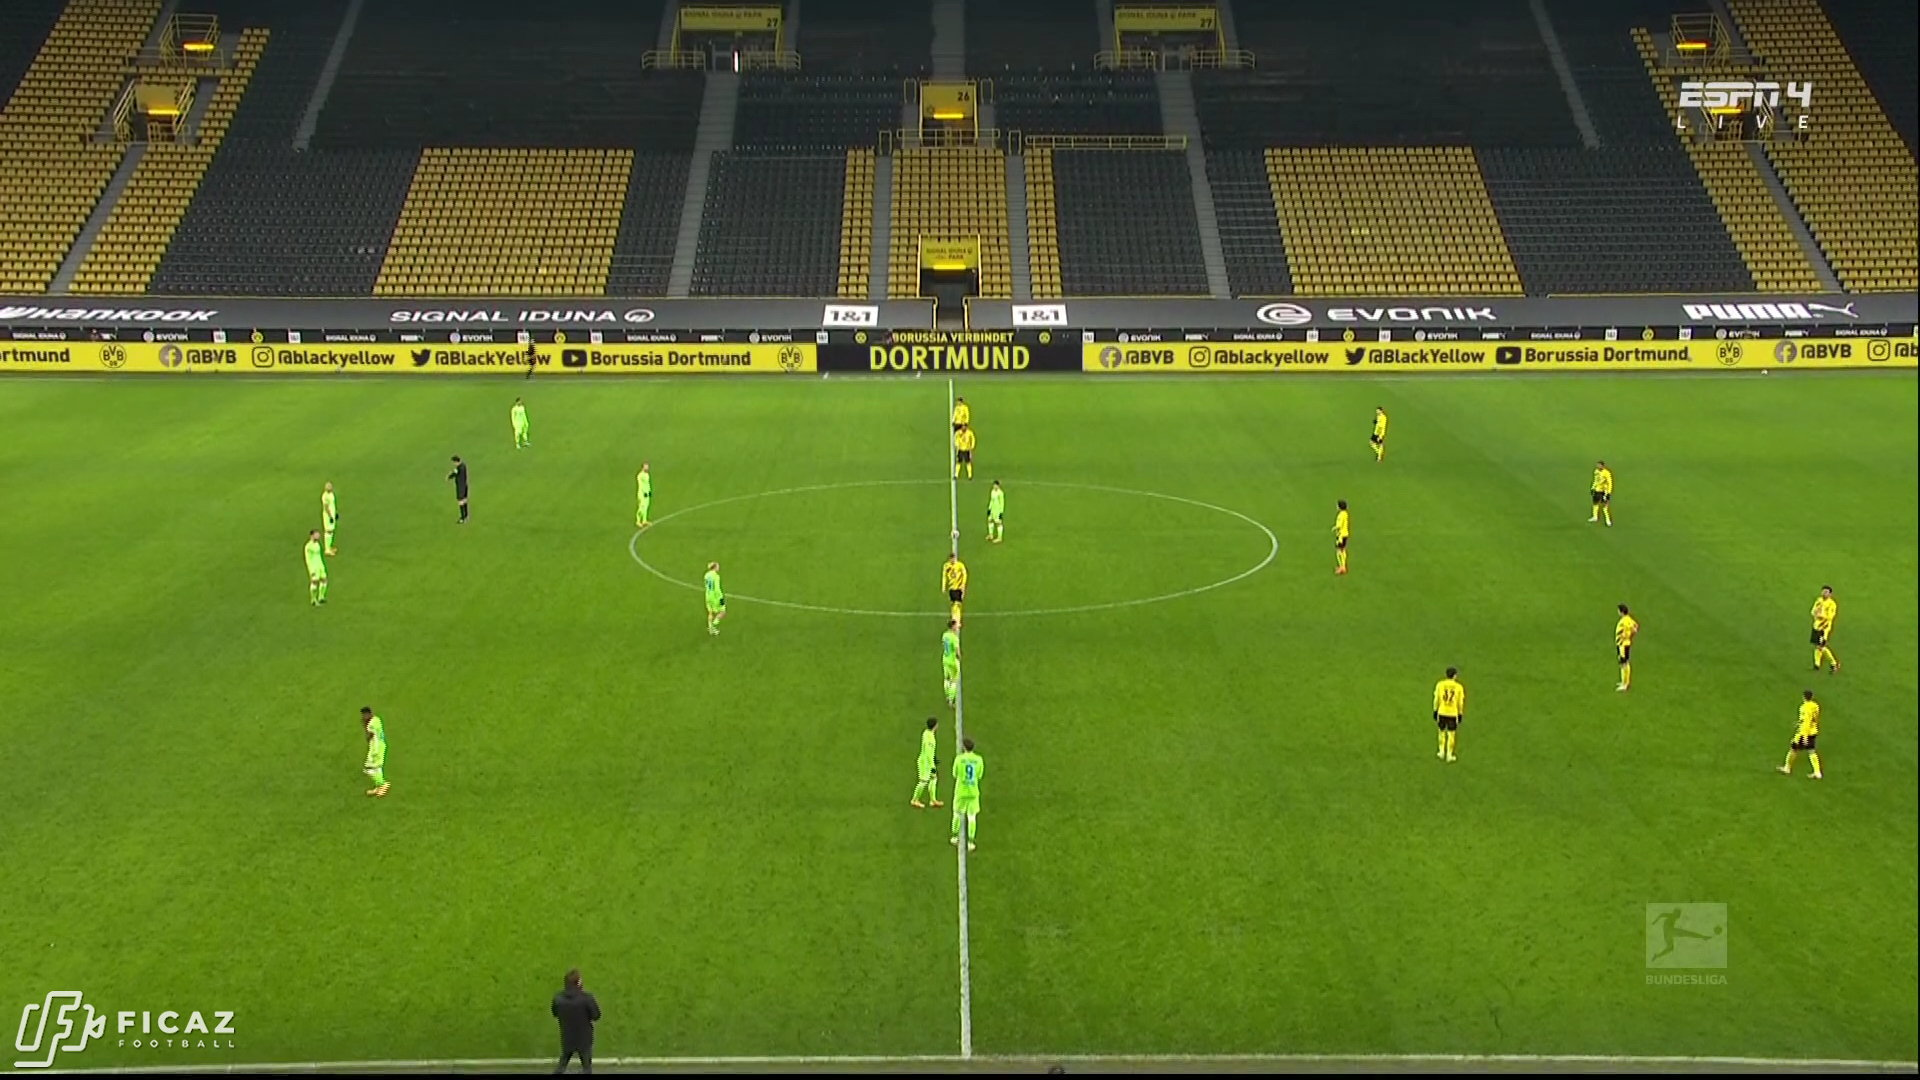 Borussia Dortmund - Main